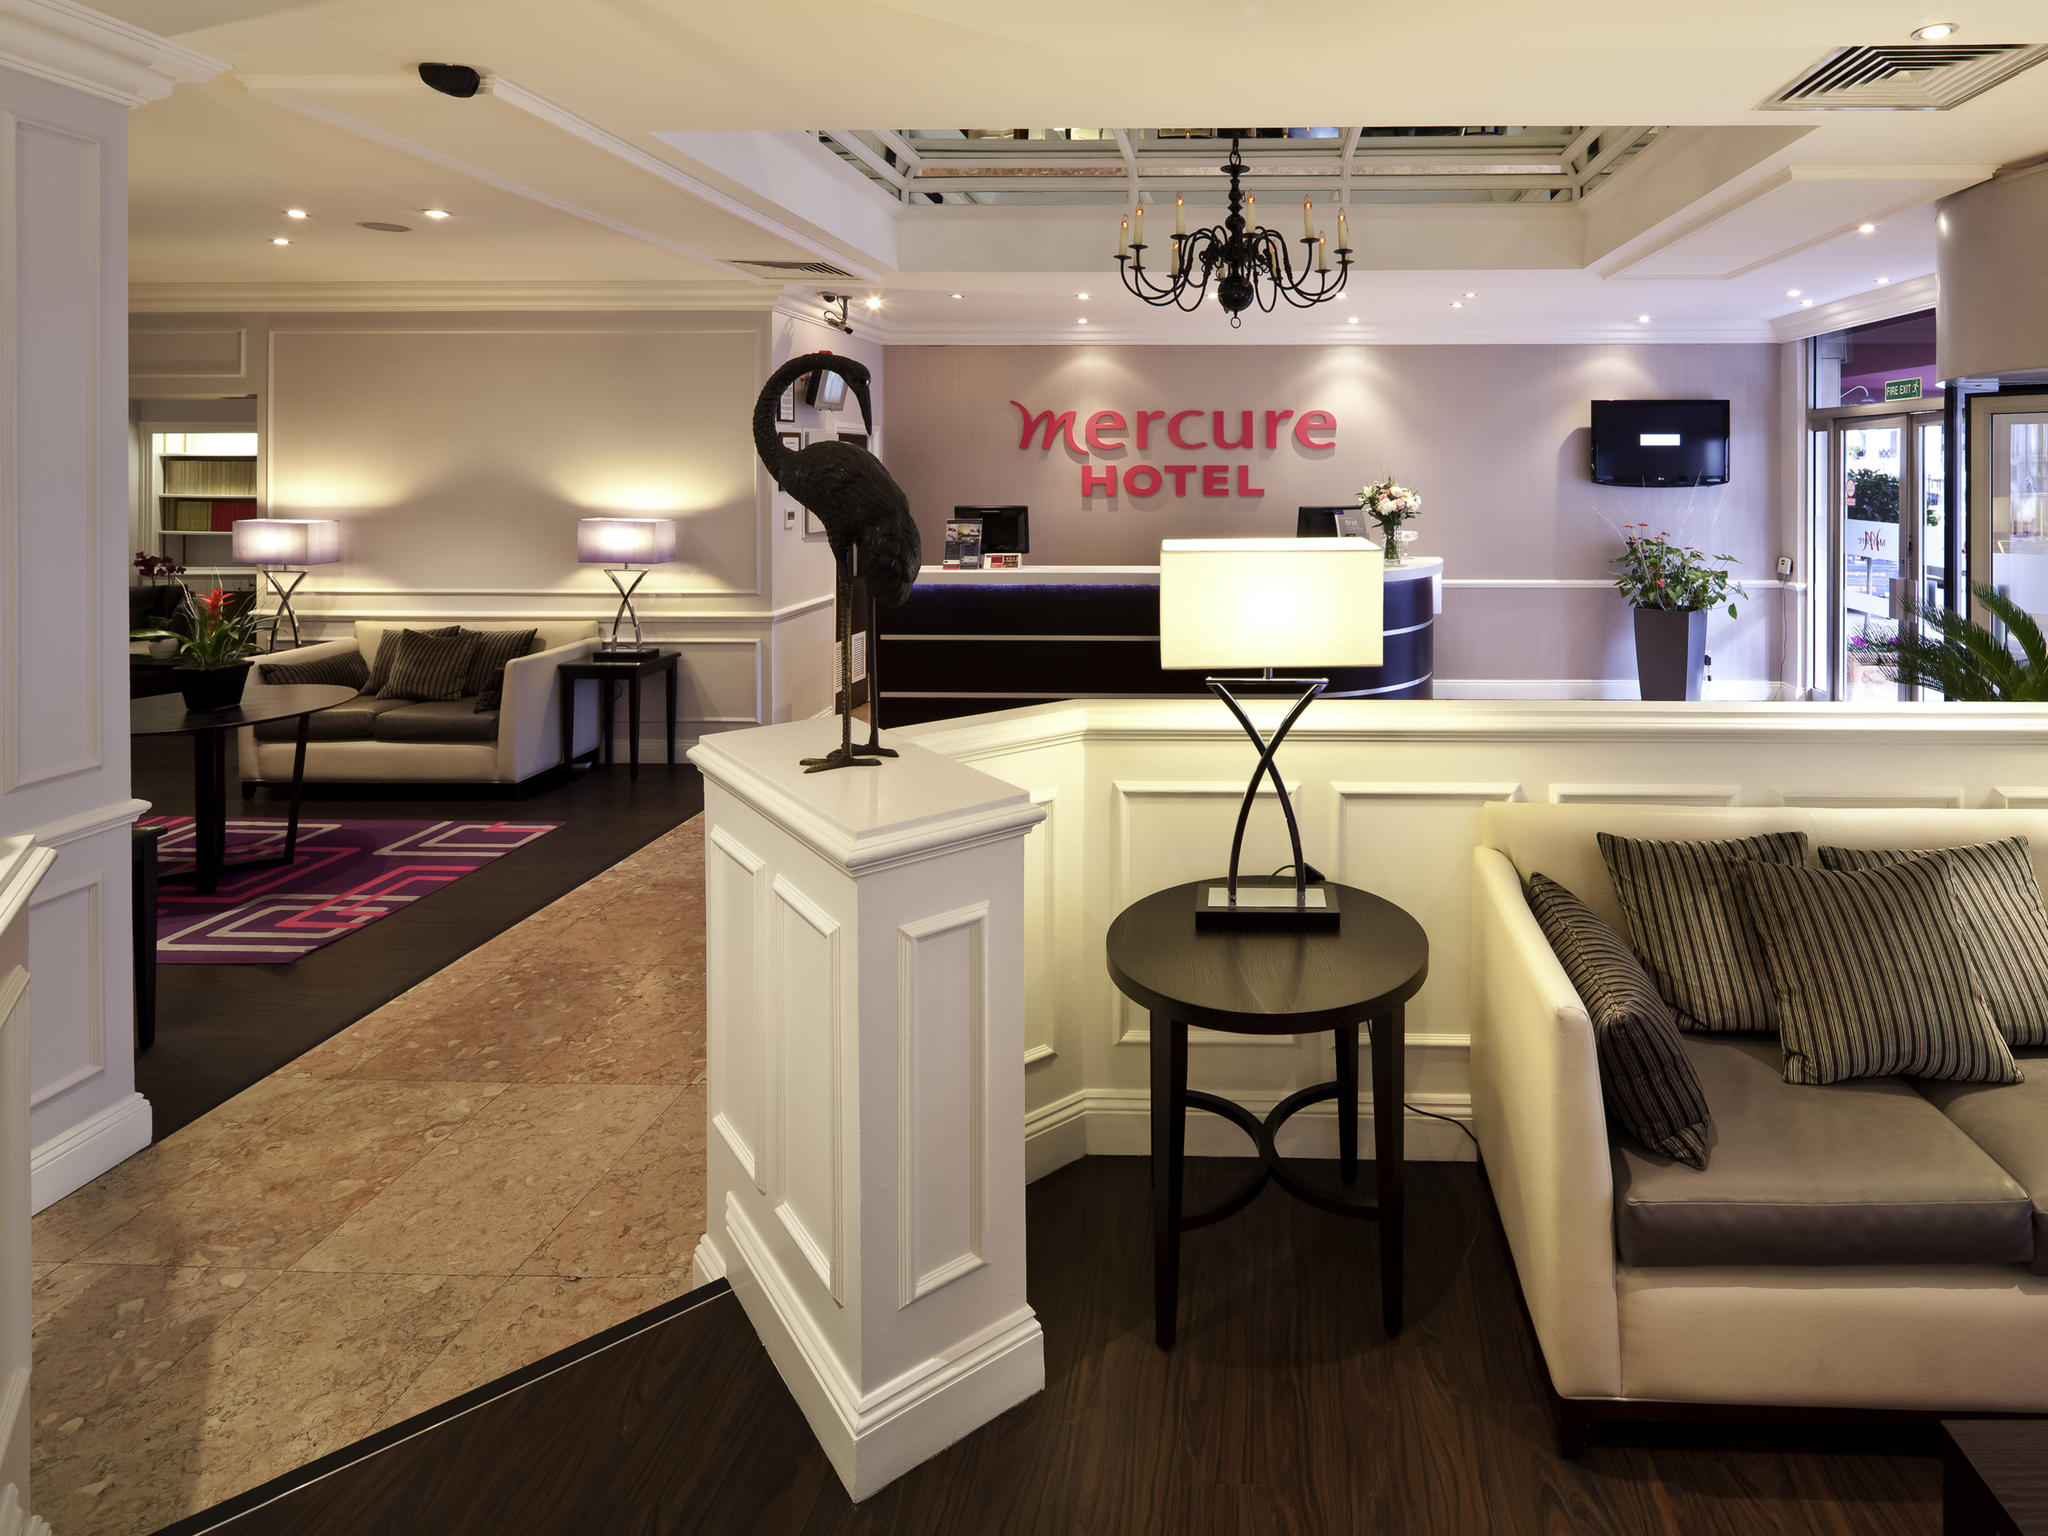 Hotel – Mercure Londen Kensington